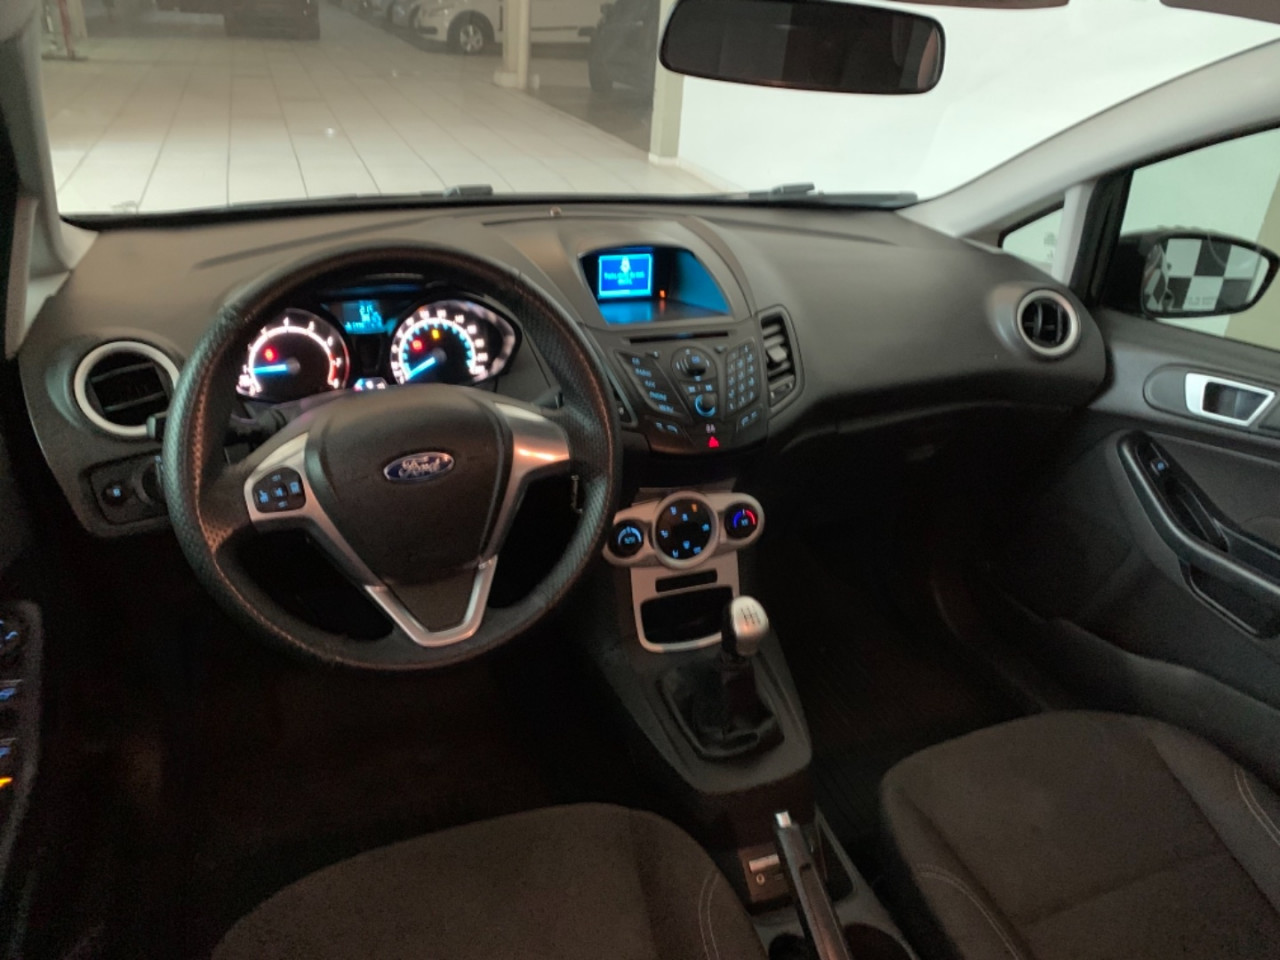 Fiesta Hatch 1.6 16V 4P SE FLEX